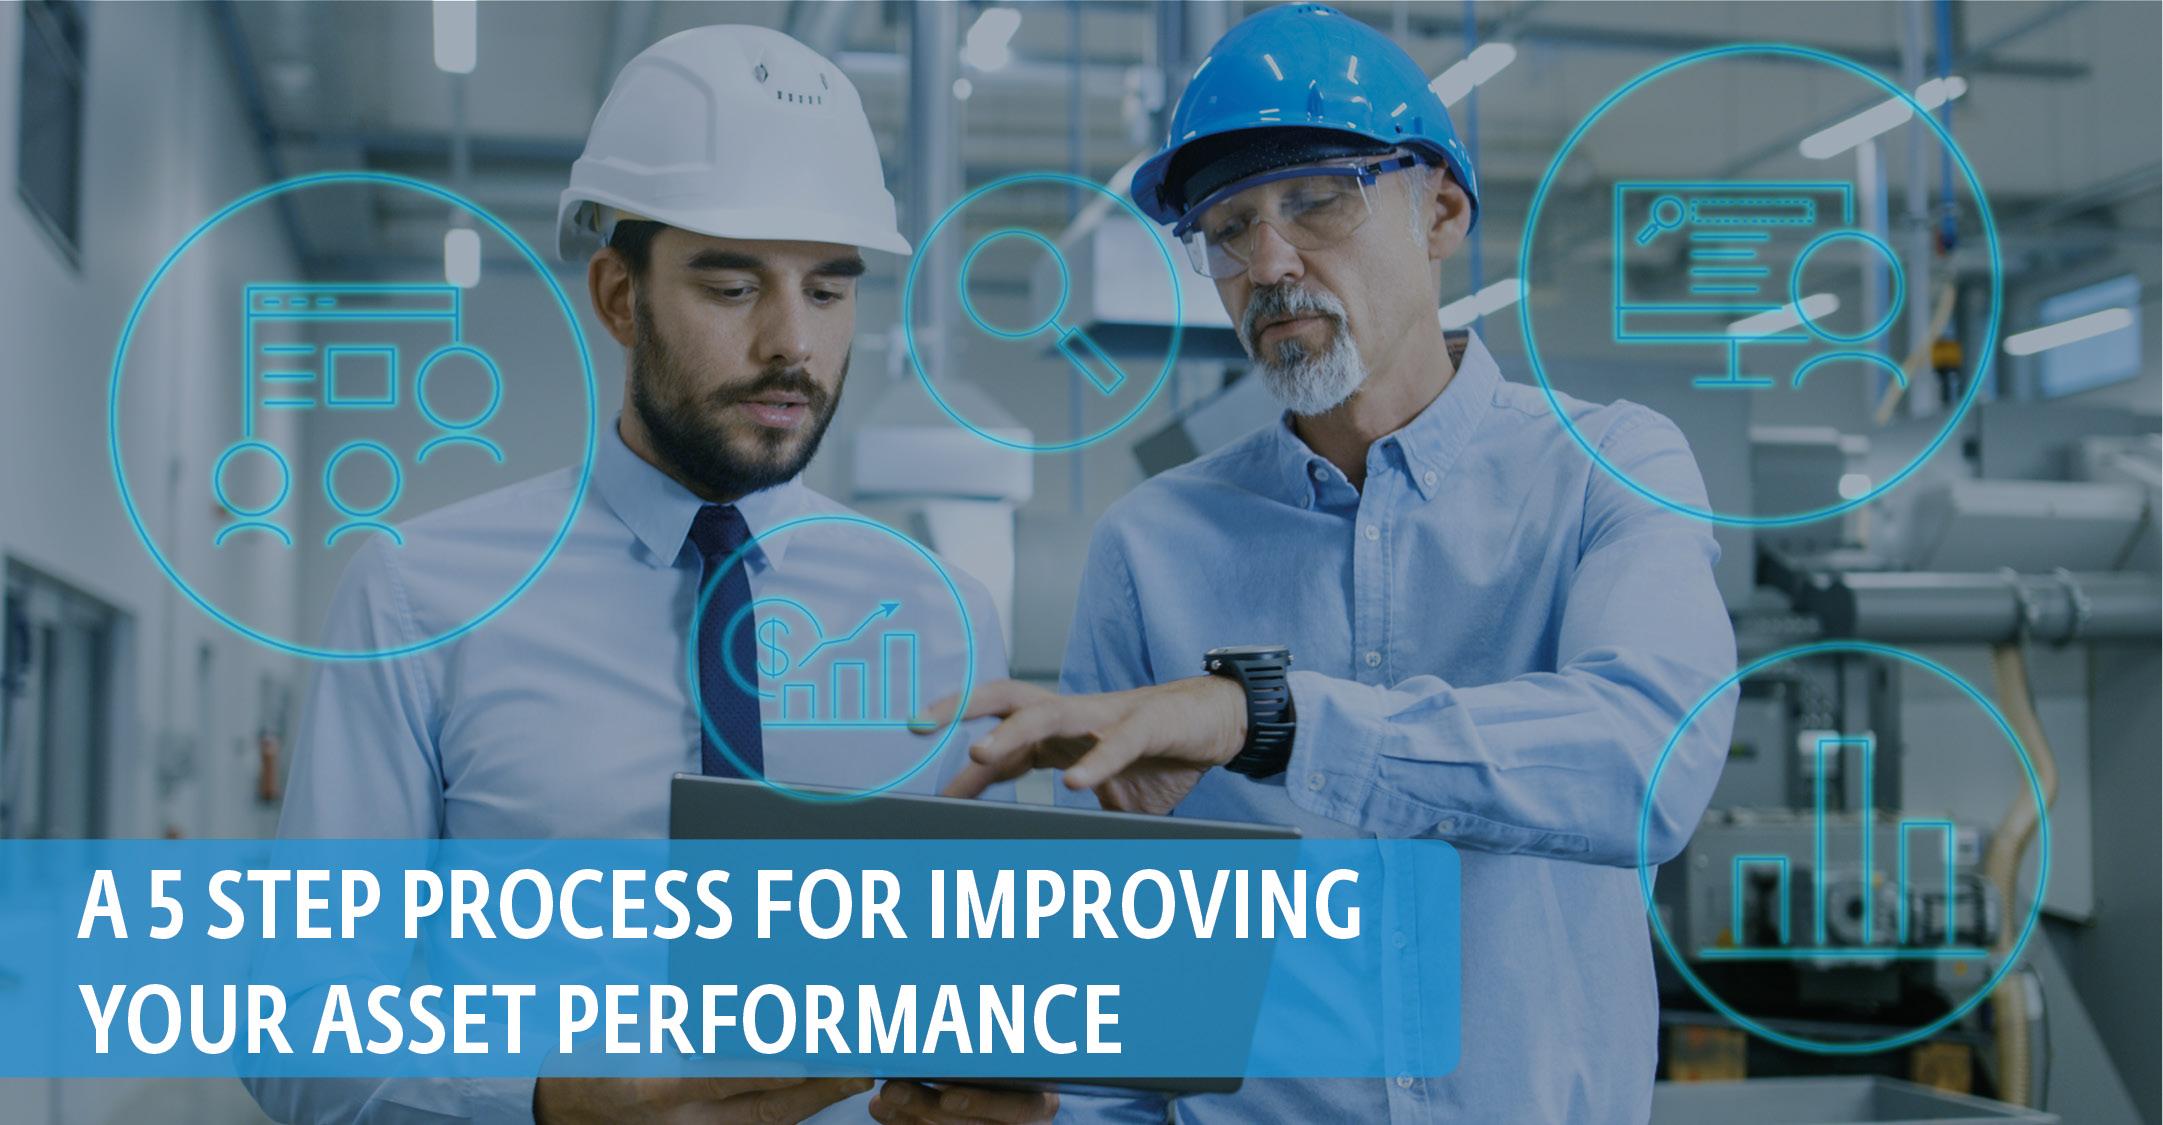 AL_Linkedin_A_6_step_process_for_improving_your_asset_performance